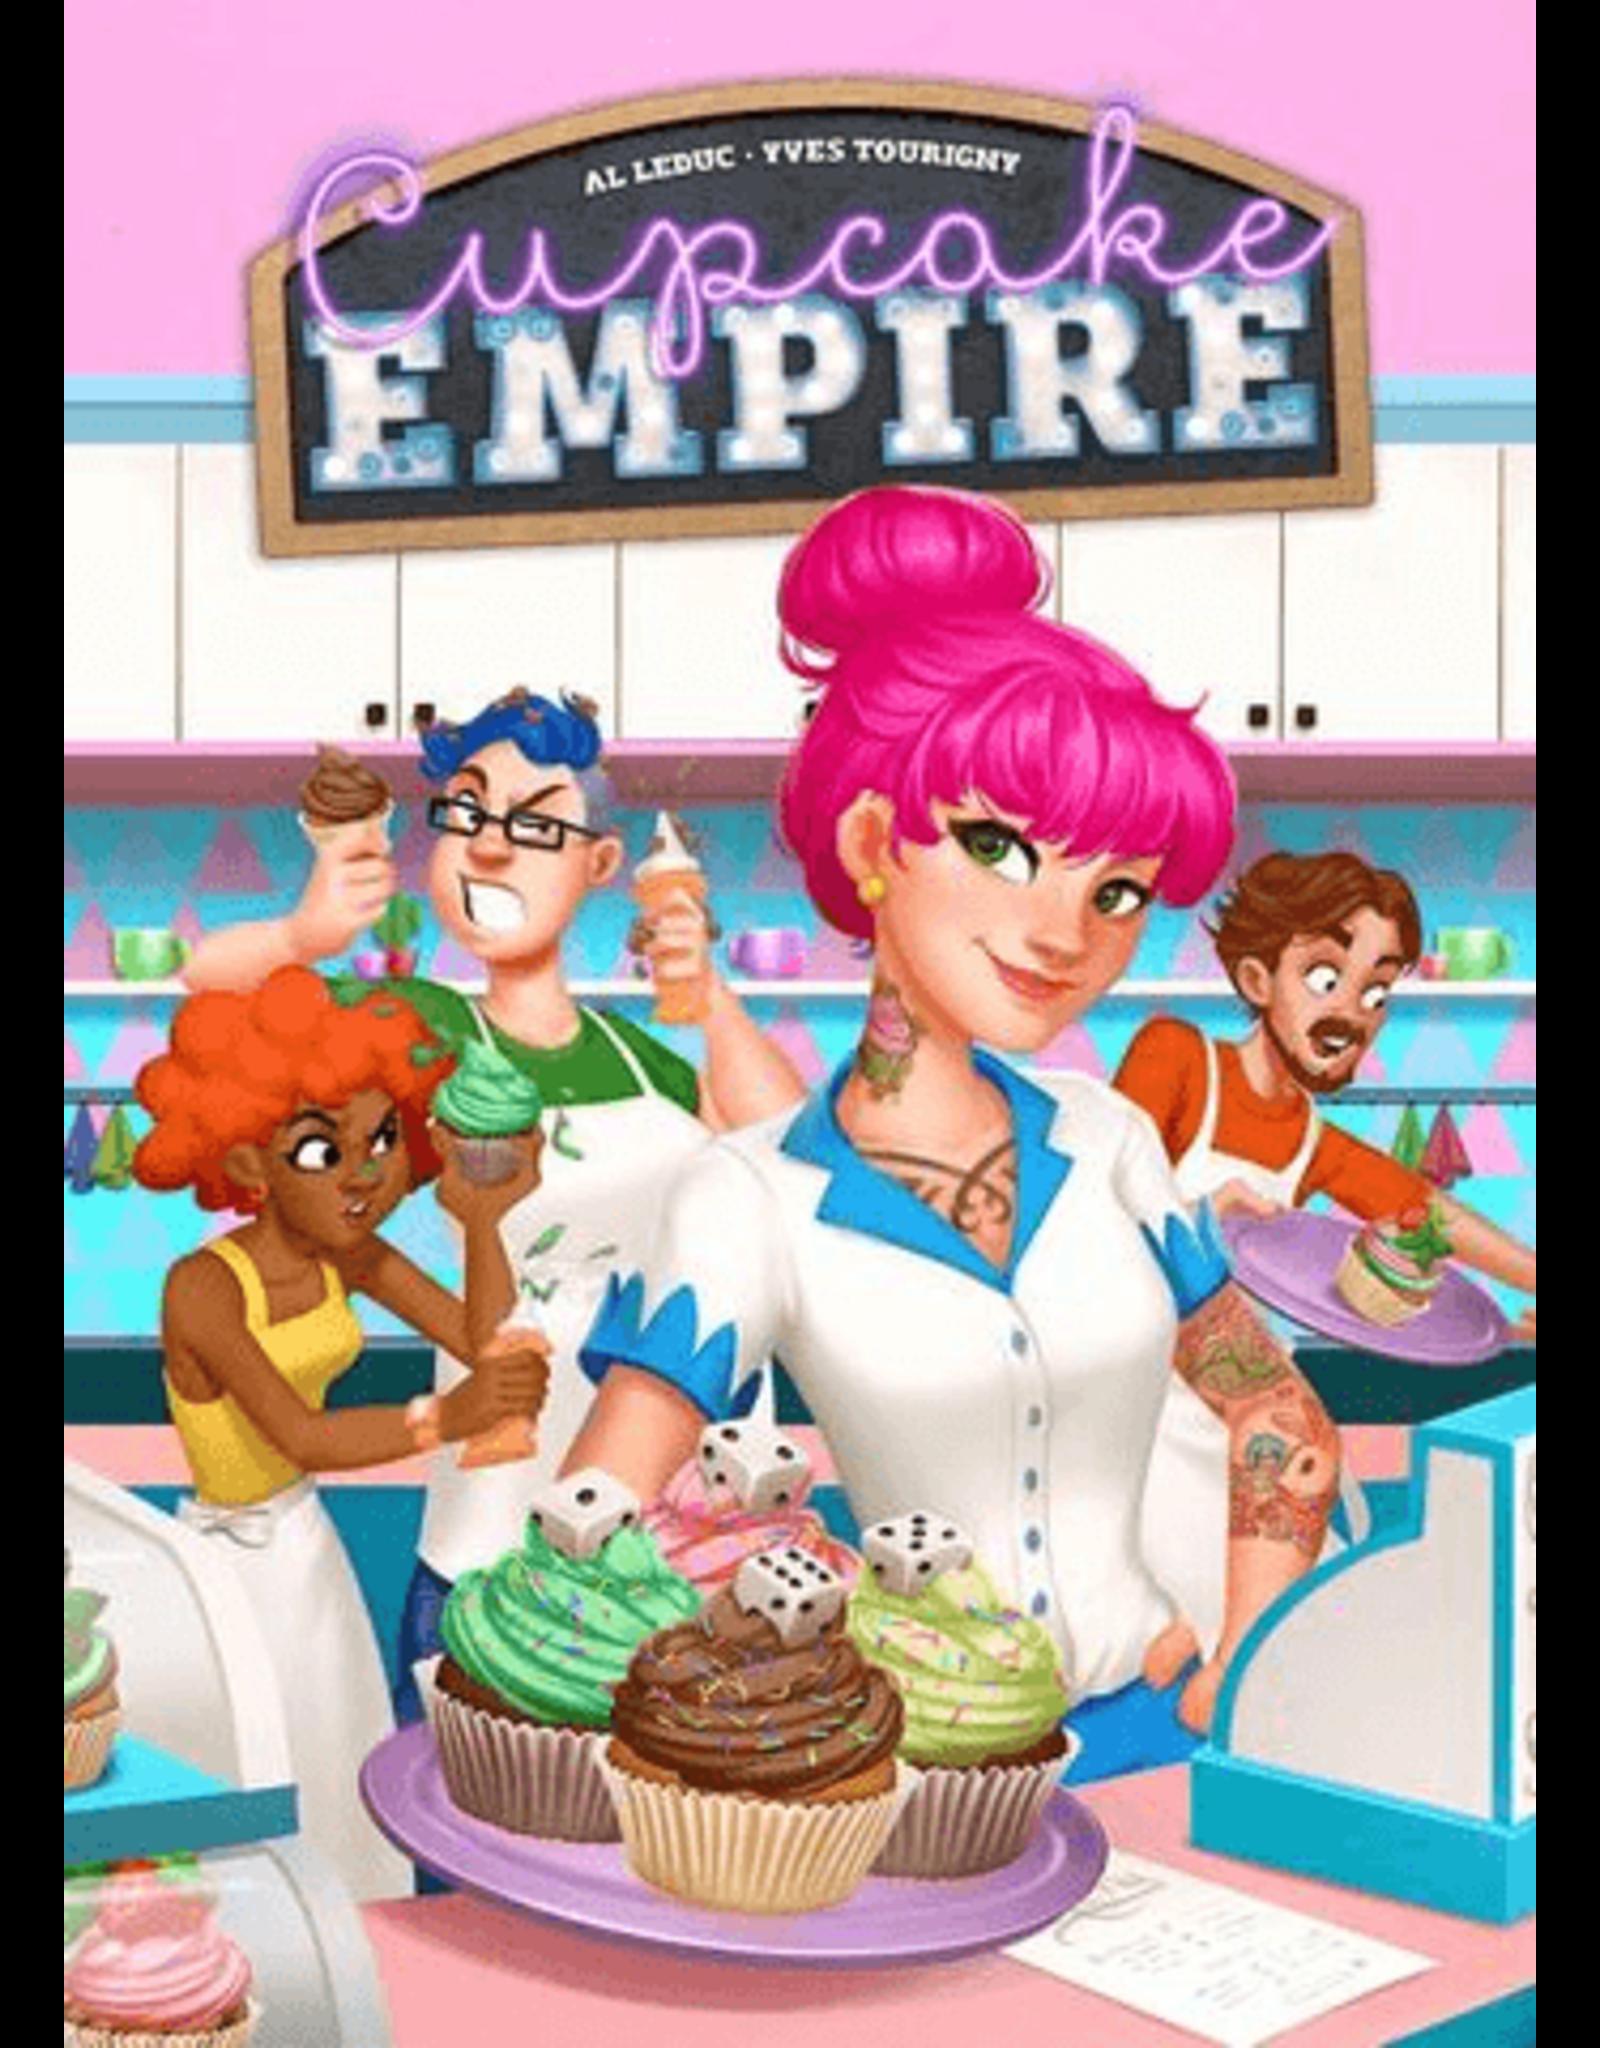 Asmodee Cupcake Empire